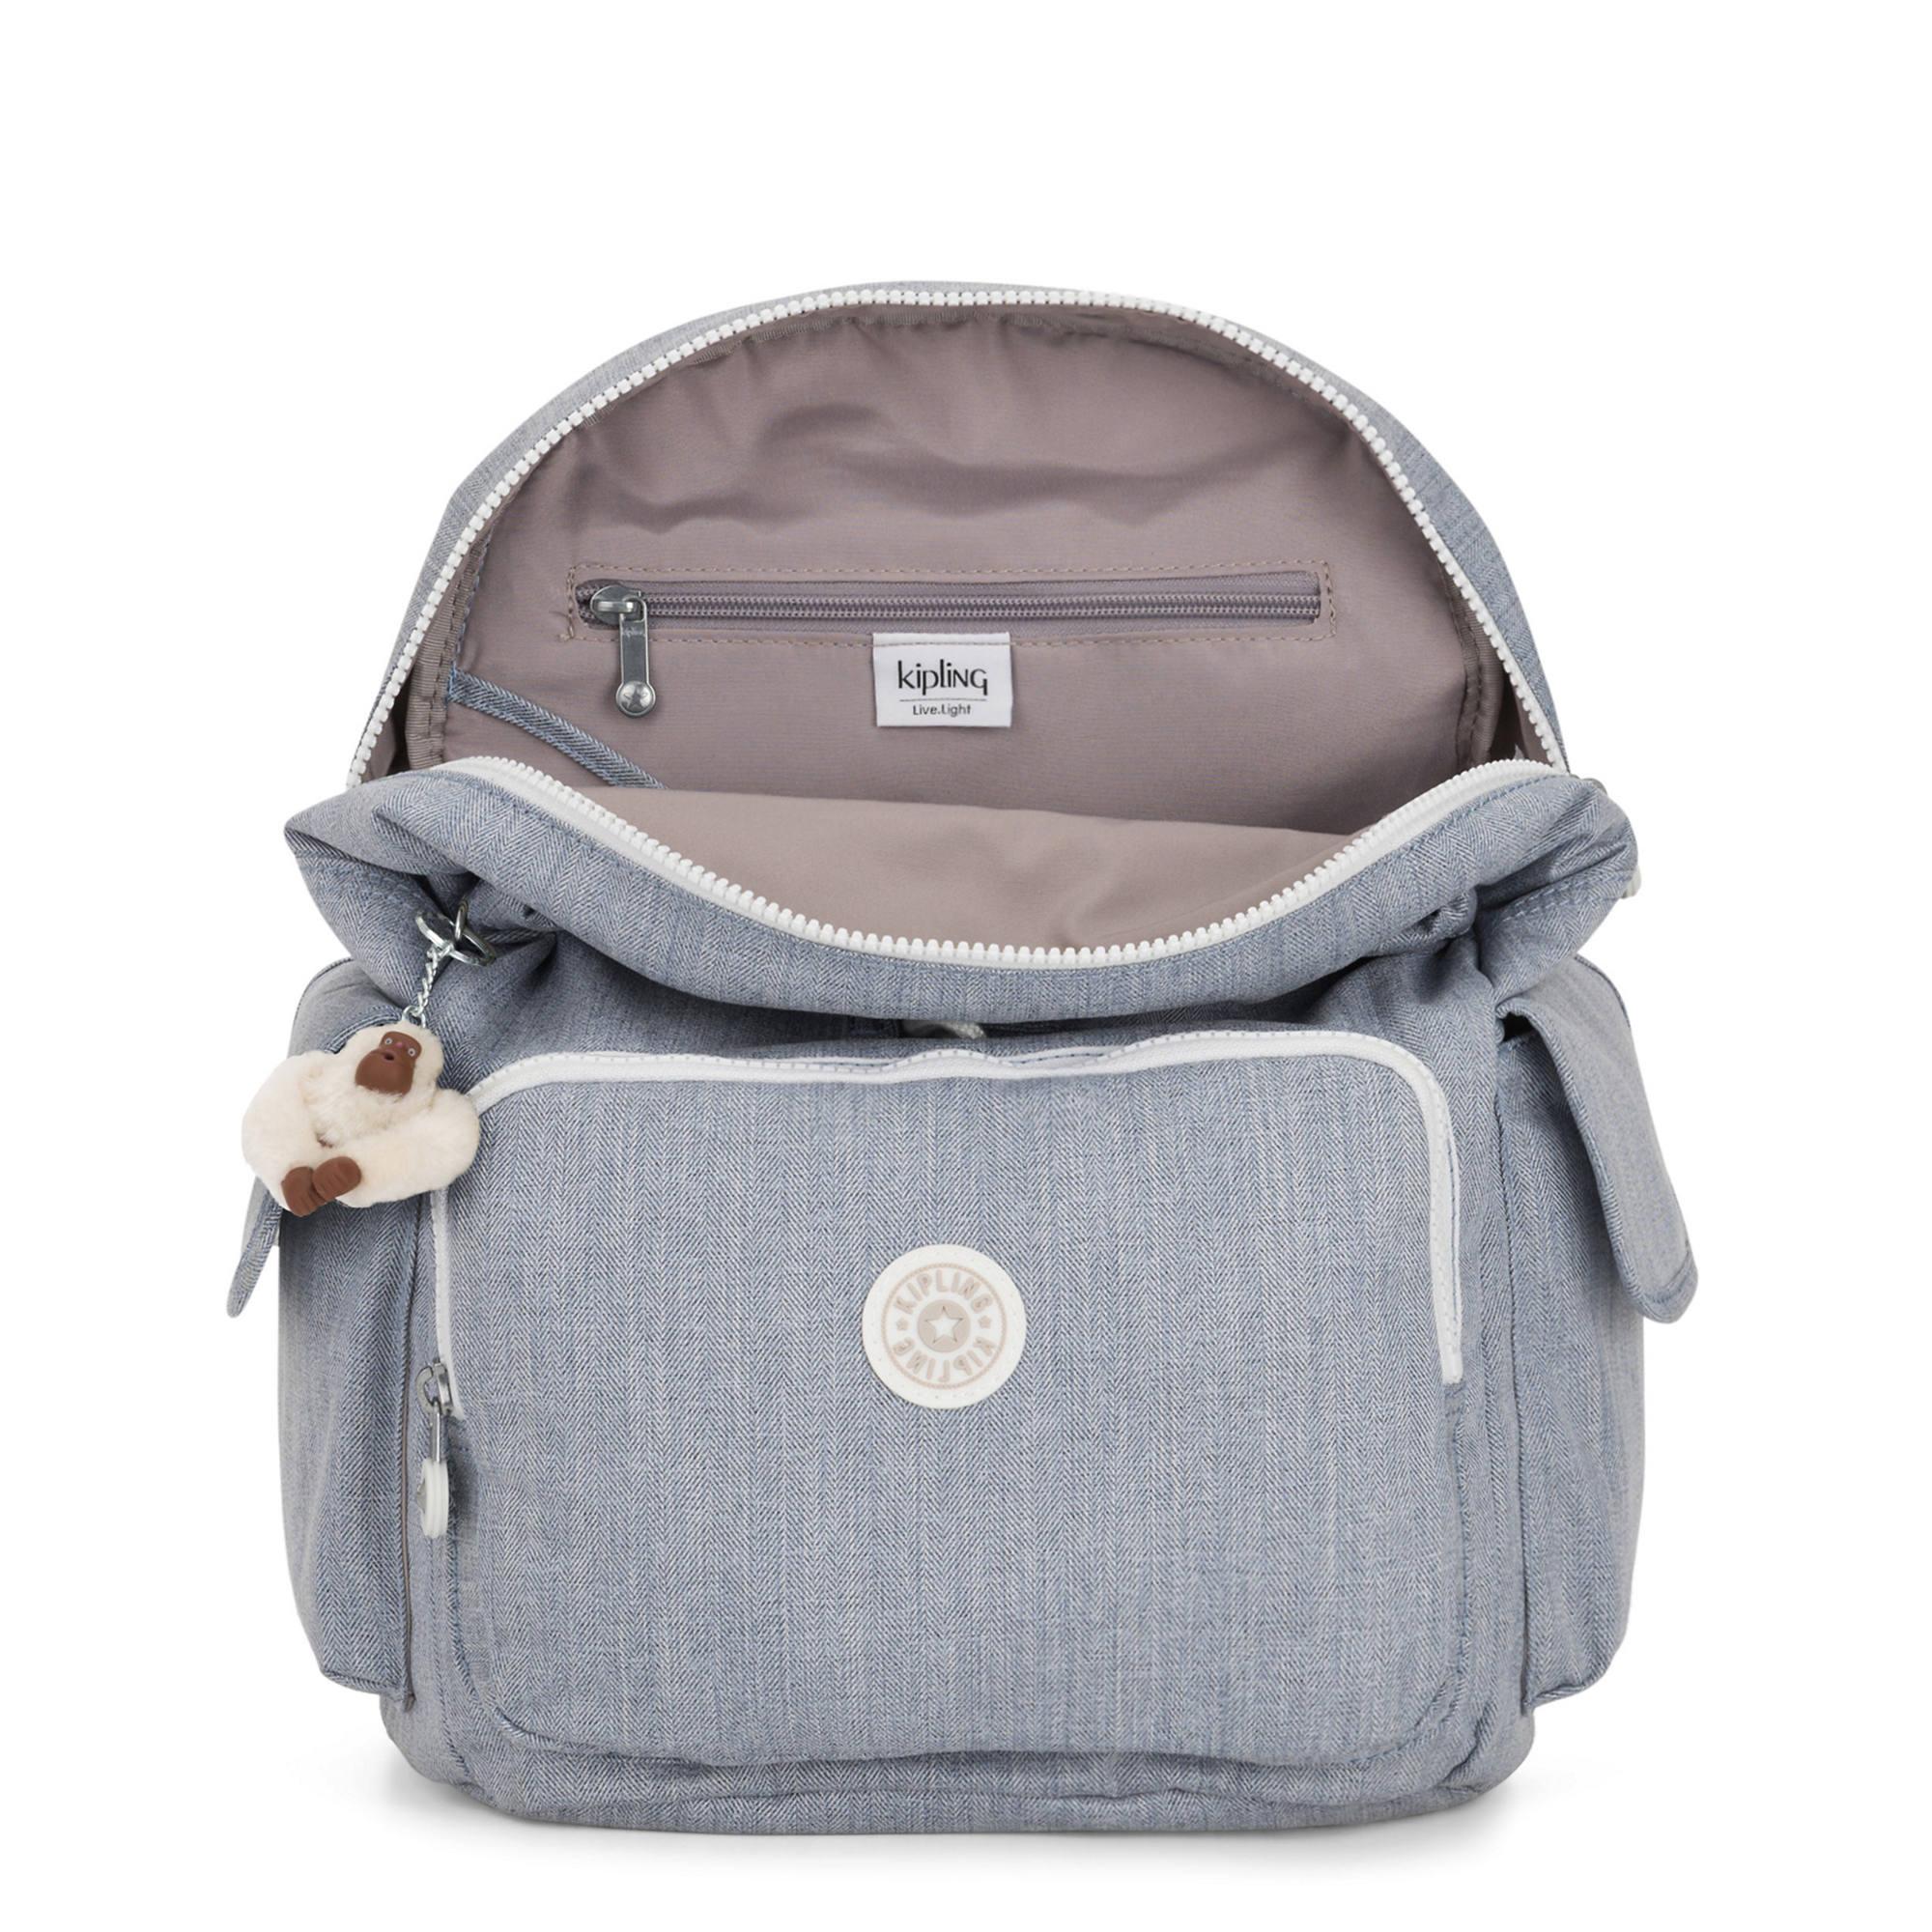 439f4f228cb9 City Pack Backpack,Blue Weave,large